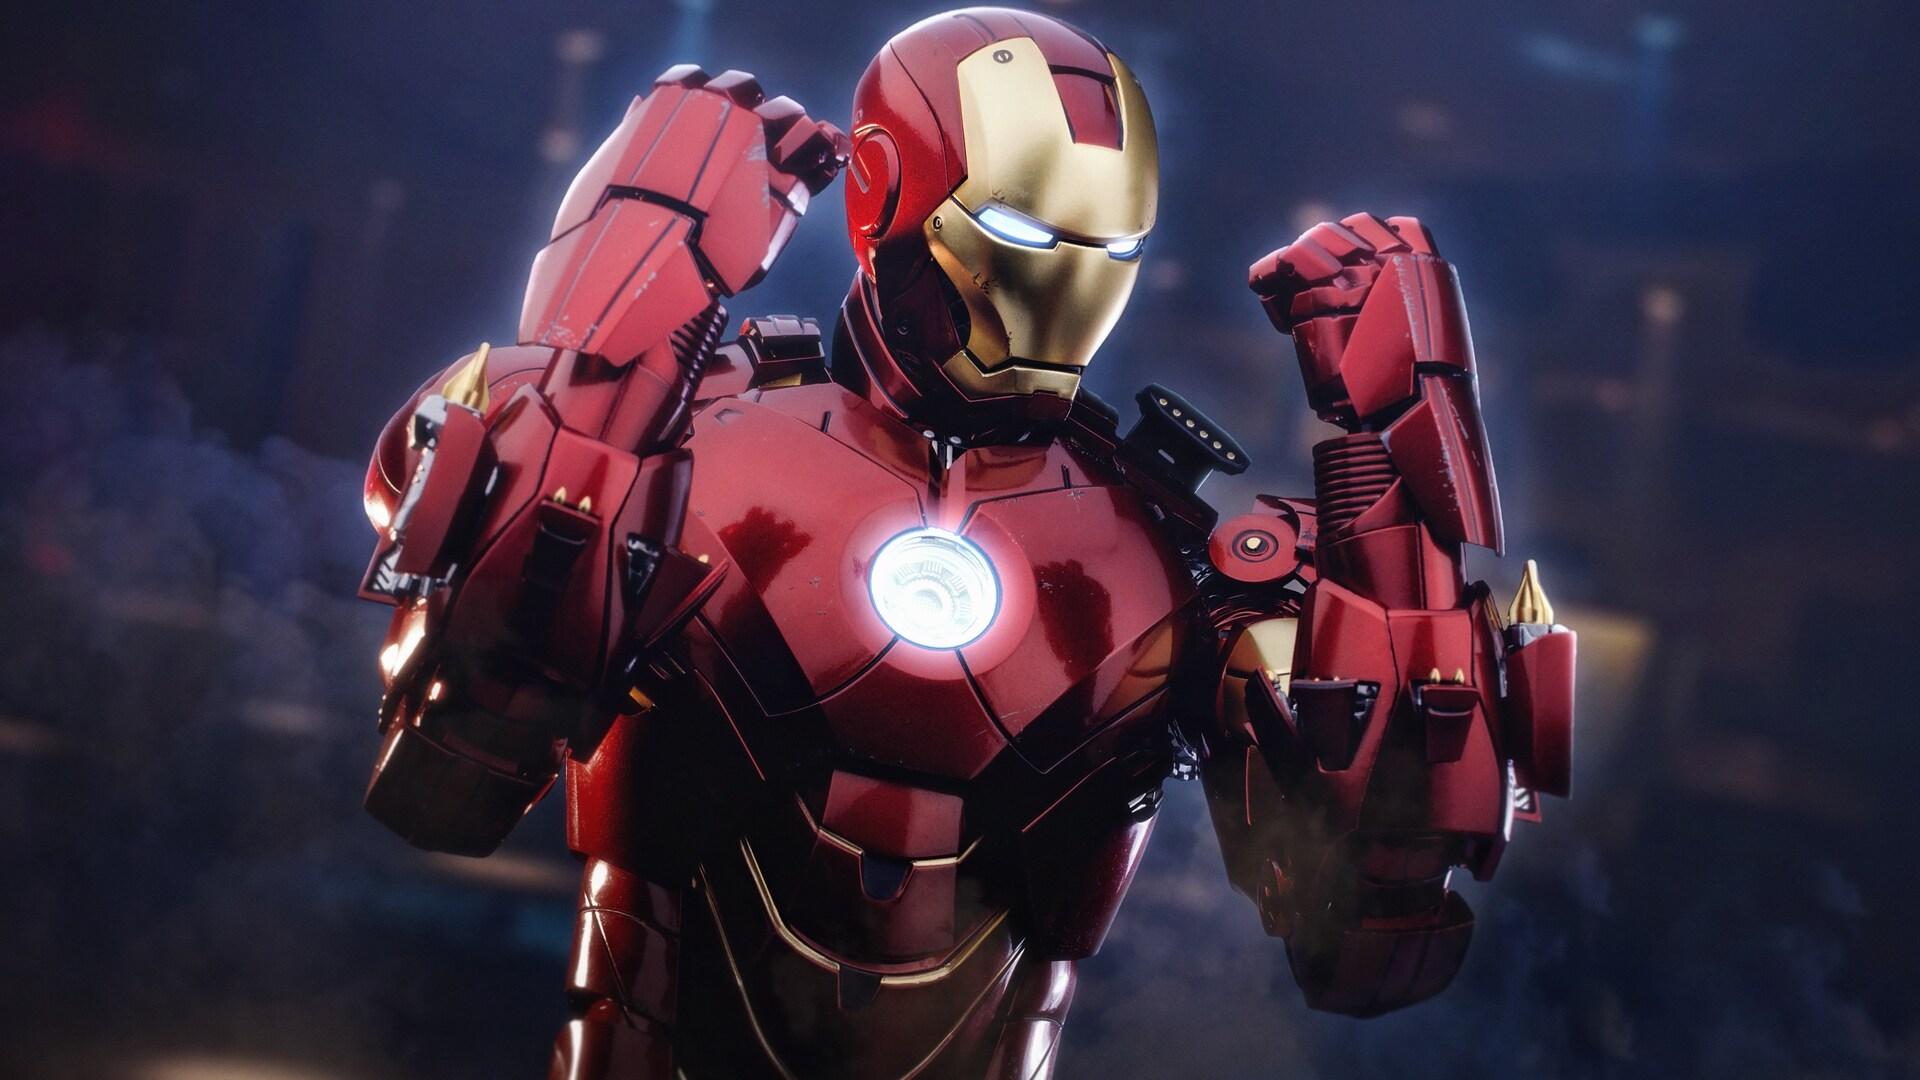 1920x1080 Iron Man Mark 4 Suit 5k Laptop Full Hd 1080p Hd 4k